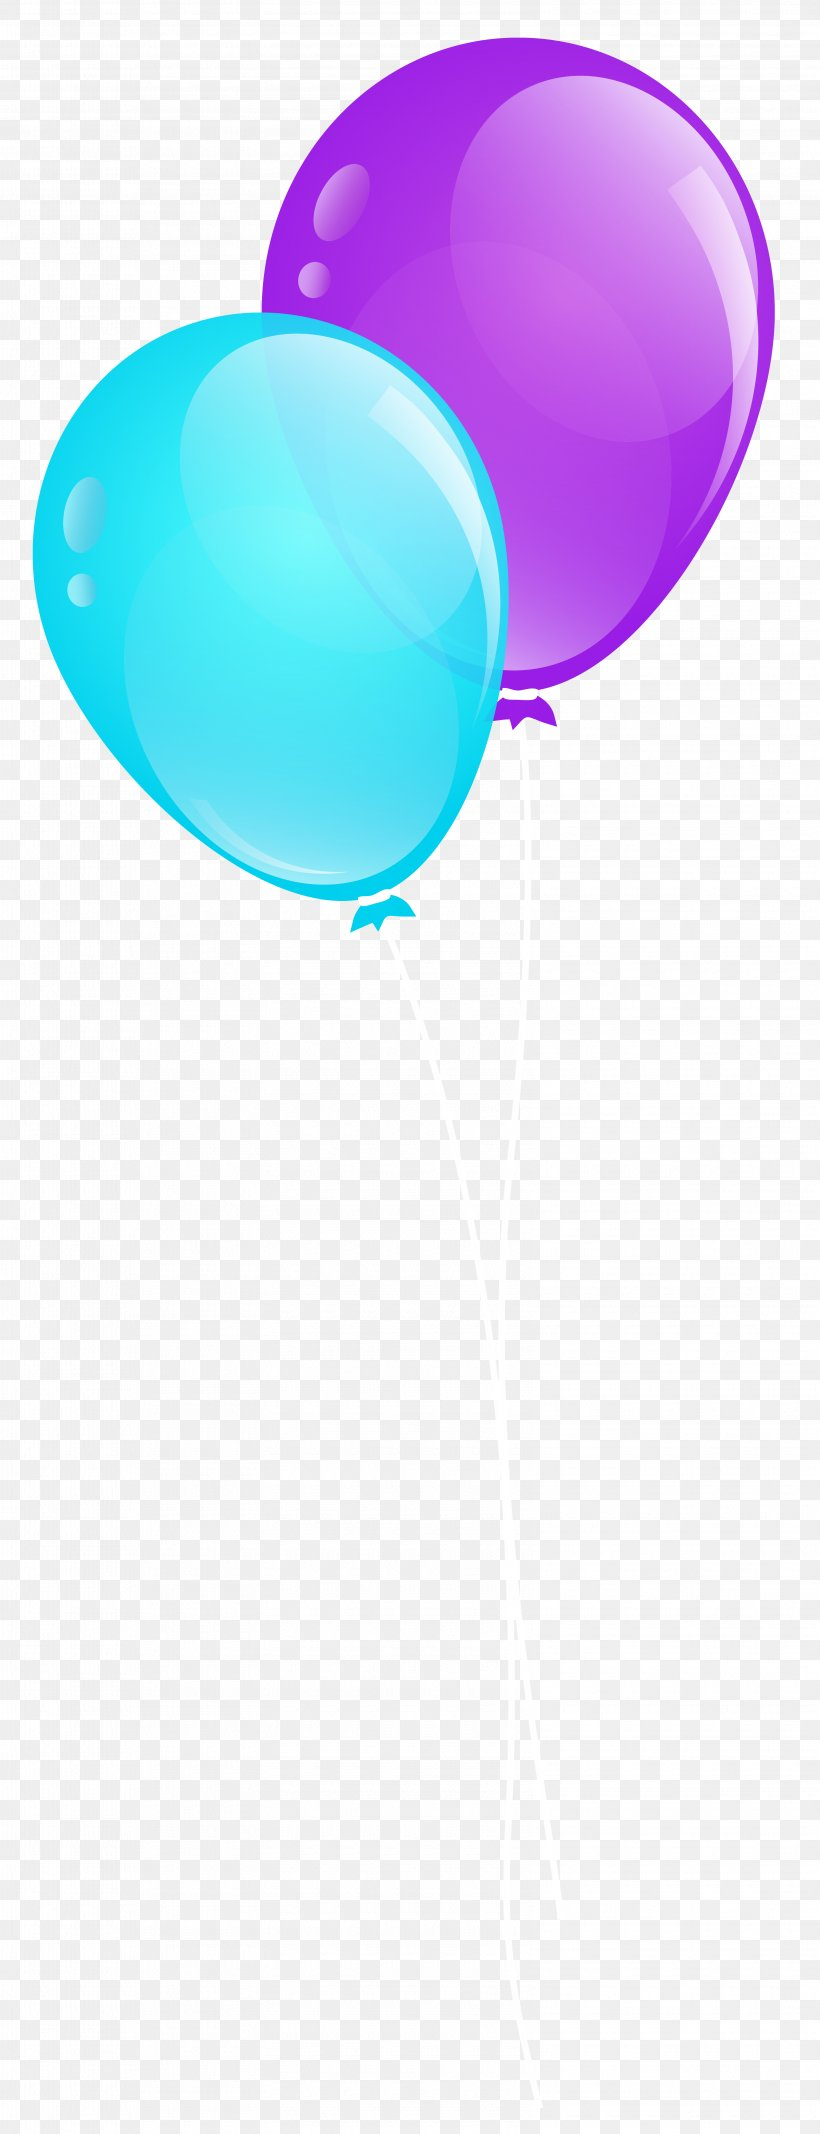 Balloon Purple Stock Photography Clip Art, PNG, 3155x8214px, Purple, Advertising, Aqua, Balloon, Blue Download Free